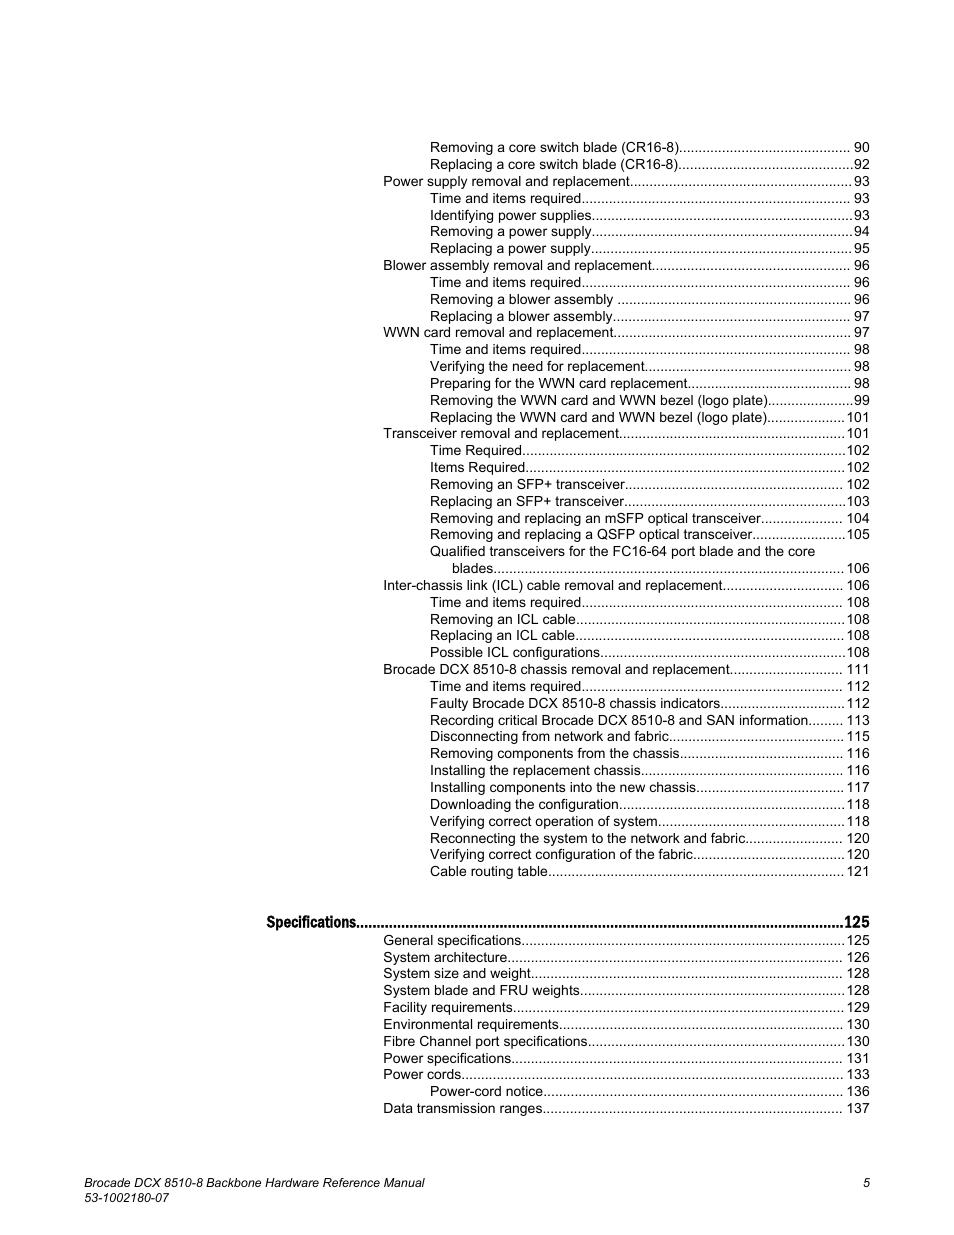 Brocade DCX 8510-8 Backbone Hardware Reference Manual User